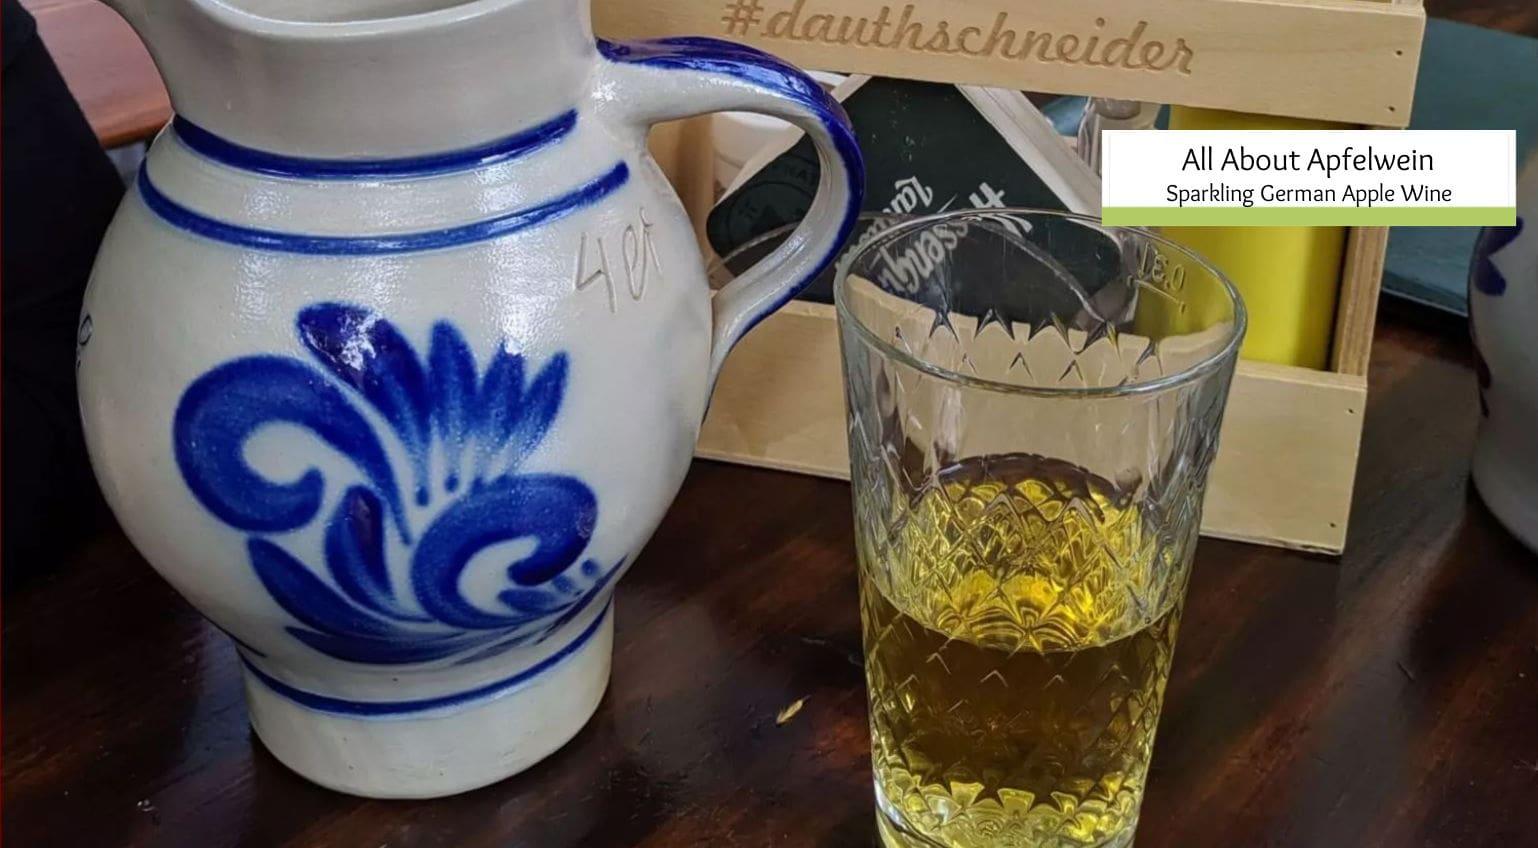 What is Apfelwein? Sparkling German Apple Wine